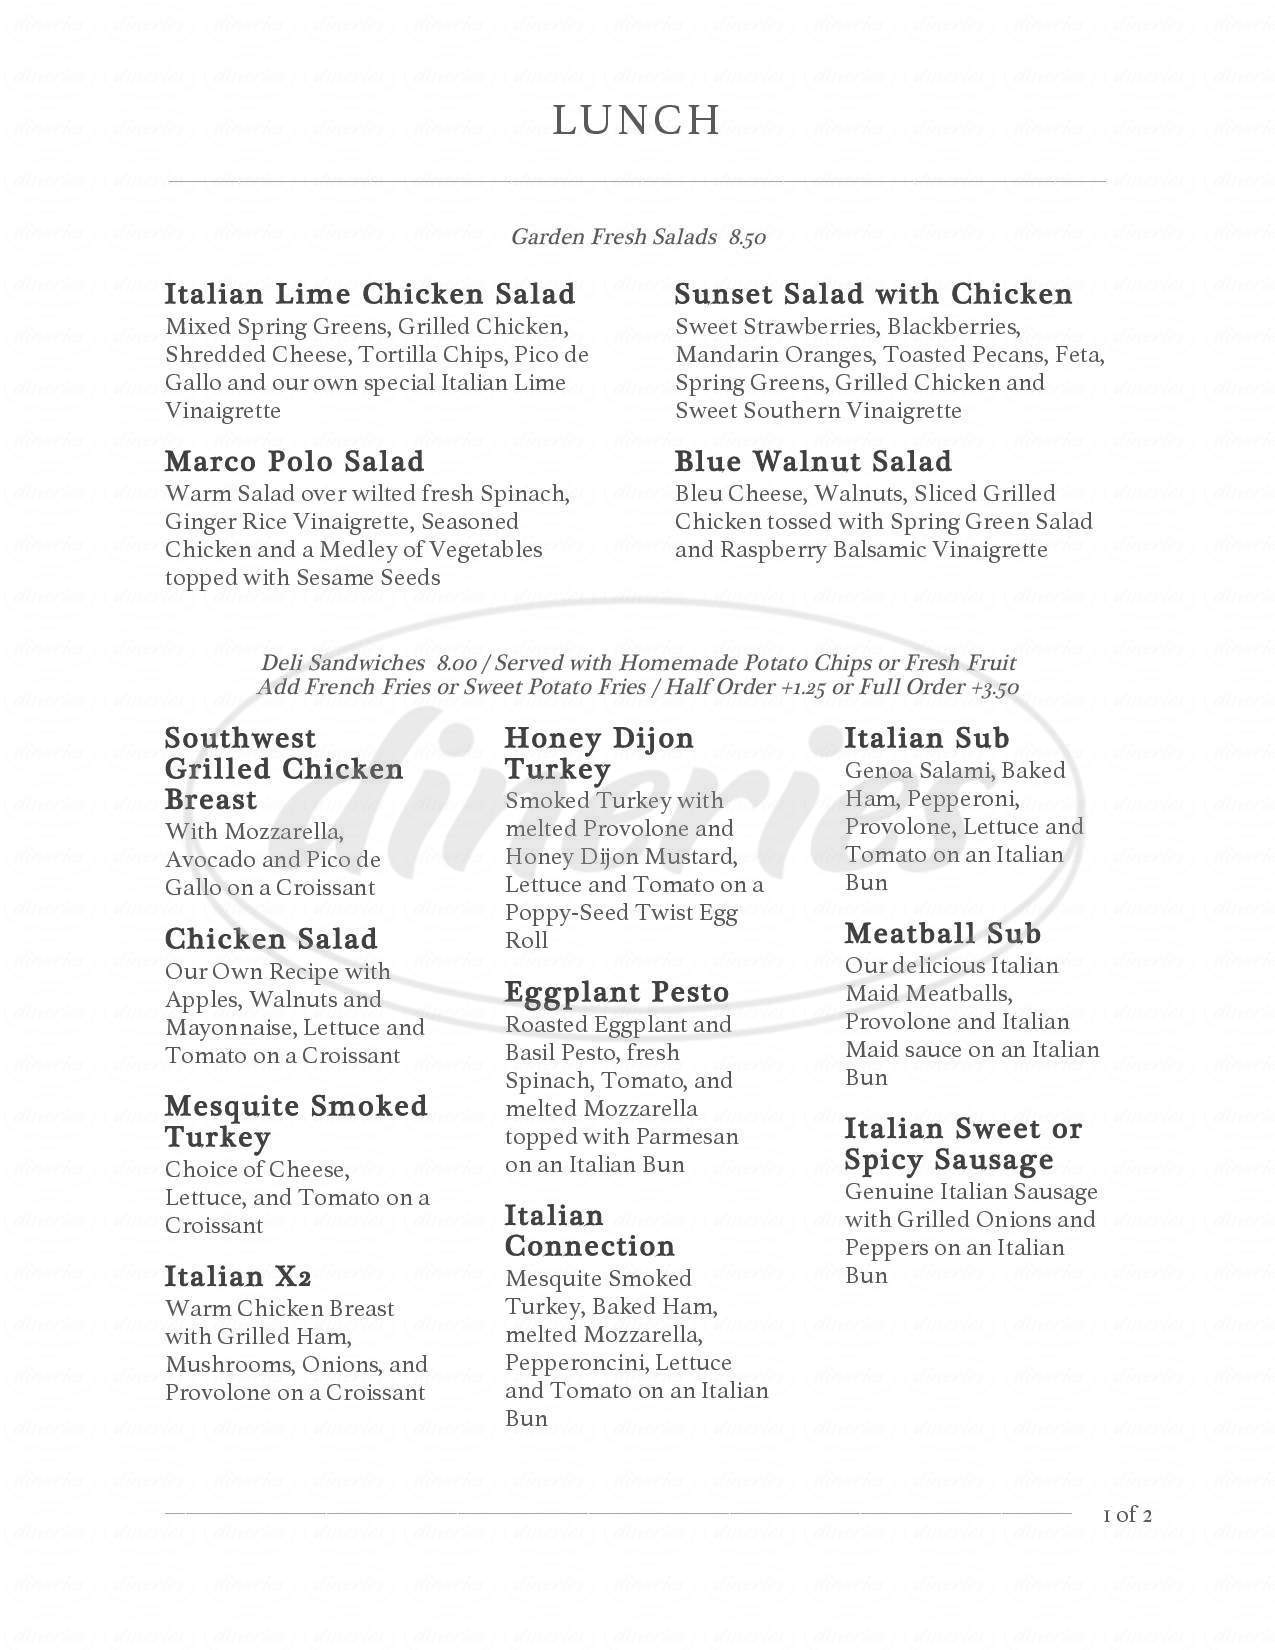 menu for Italian Maid Cafe